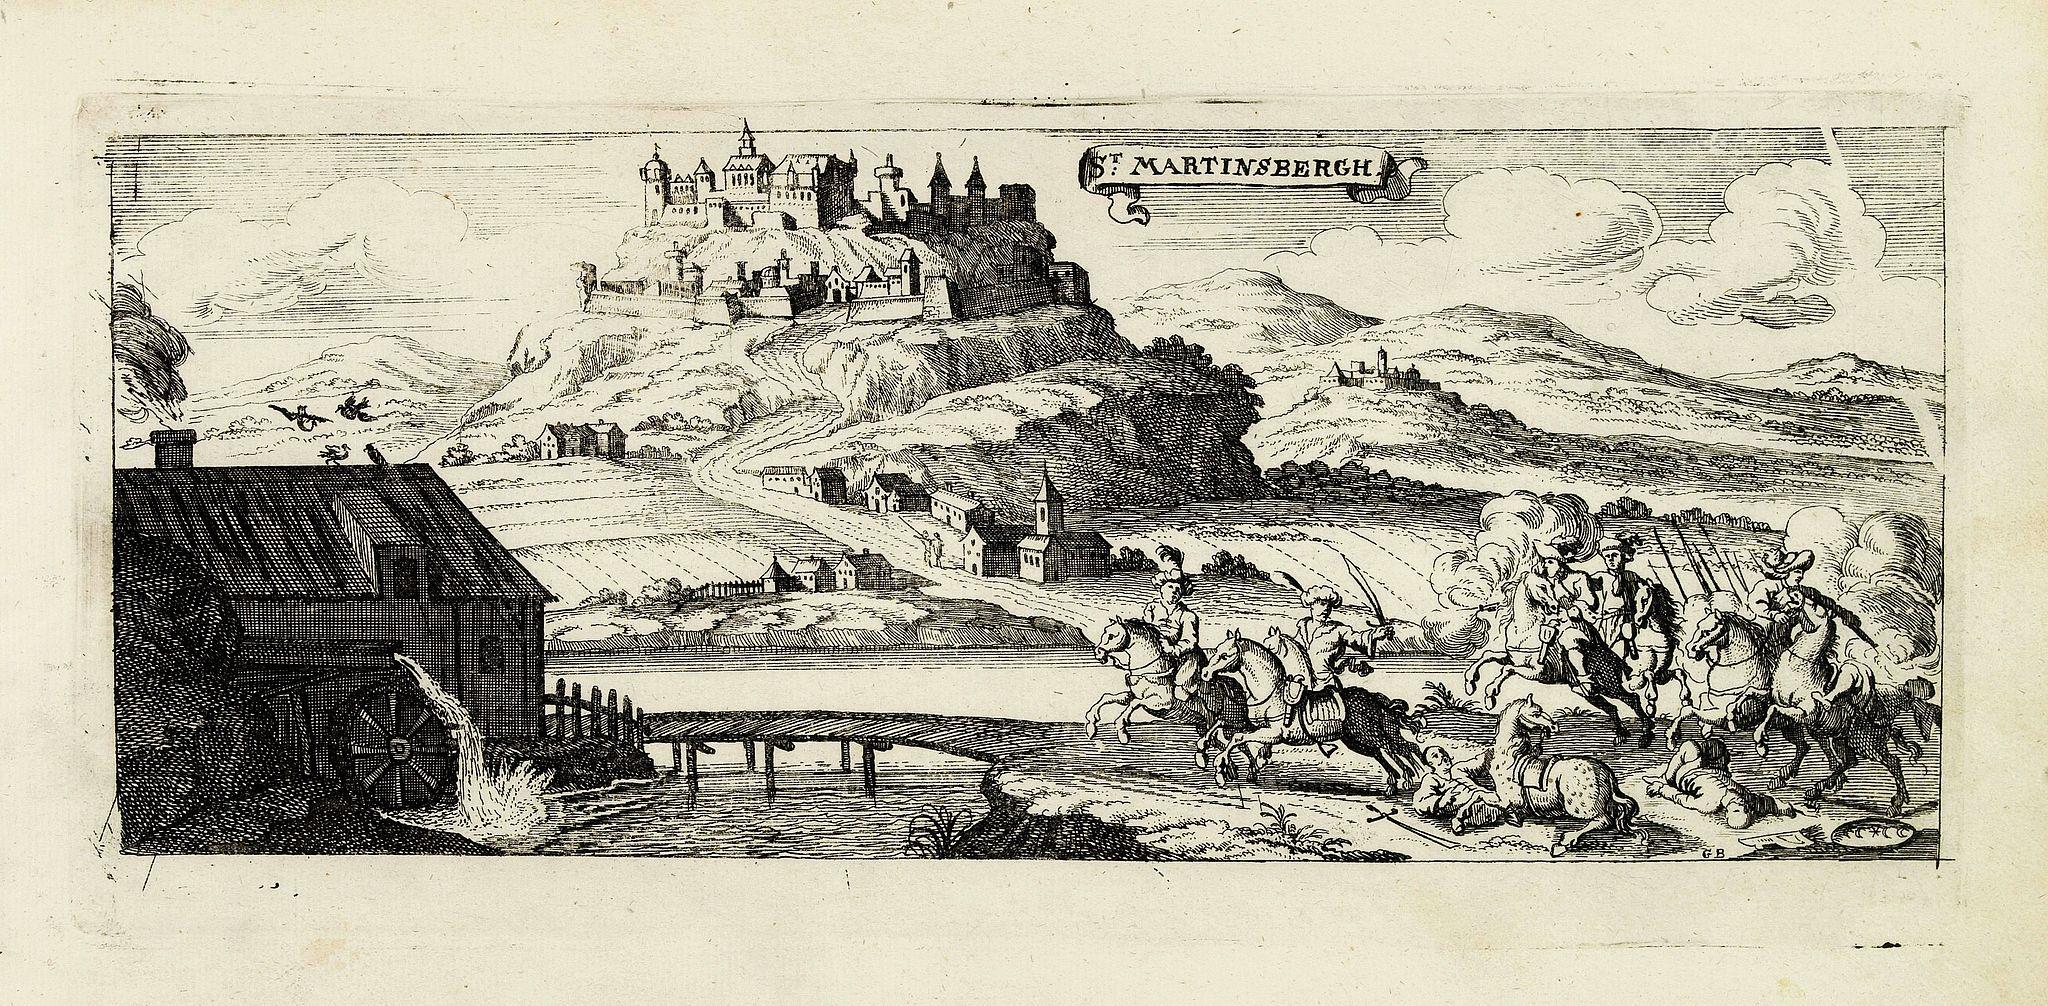 PEETERS, J. / BOUTTATS, G. -  St Martinsbergh.